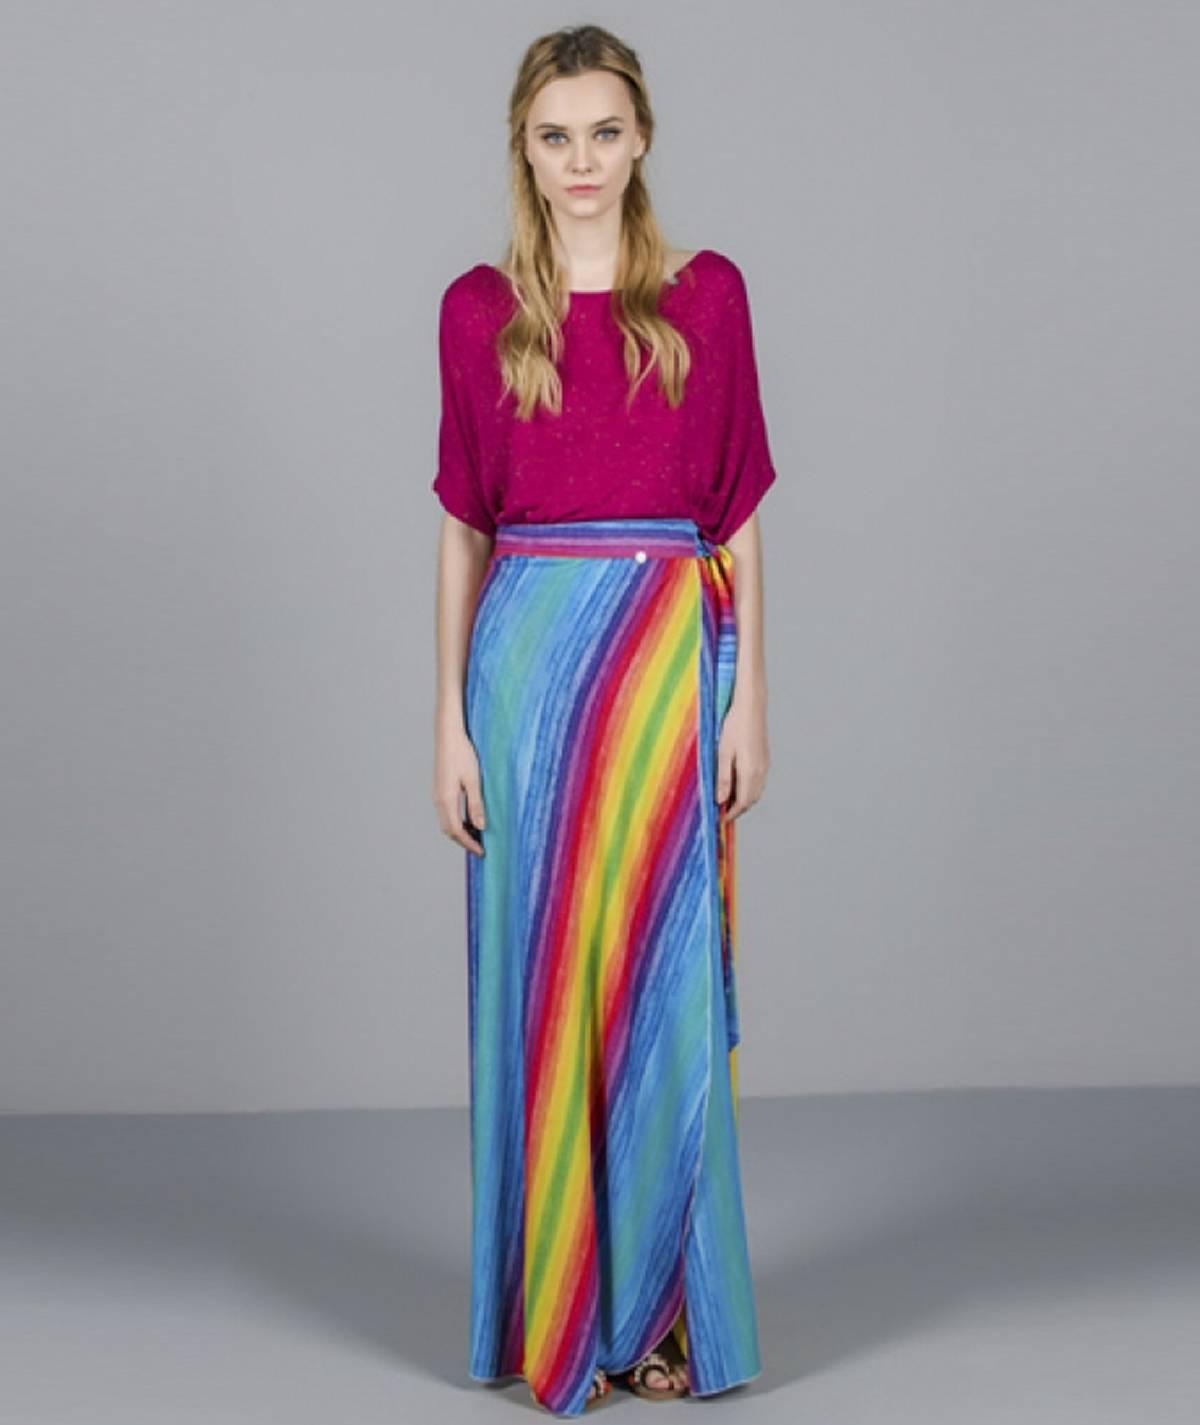 Saia estampado arco-iris